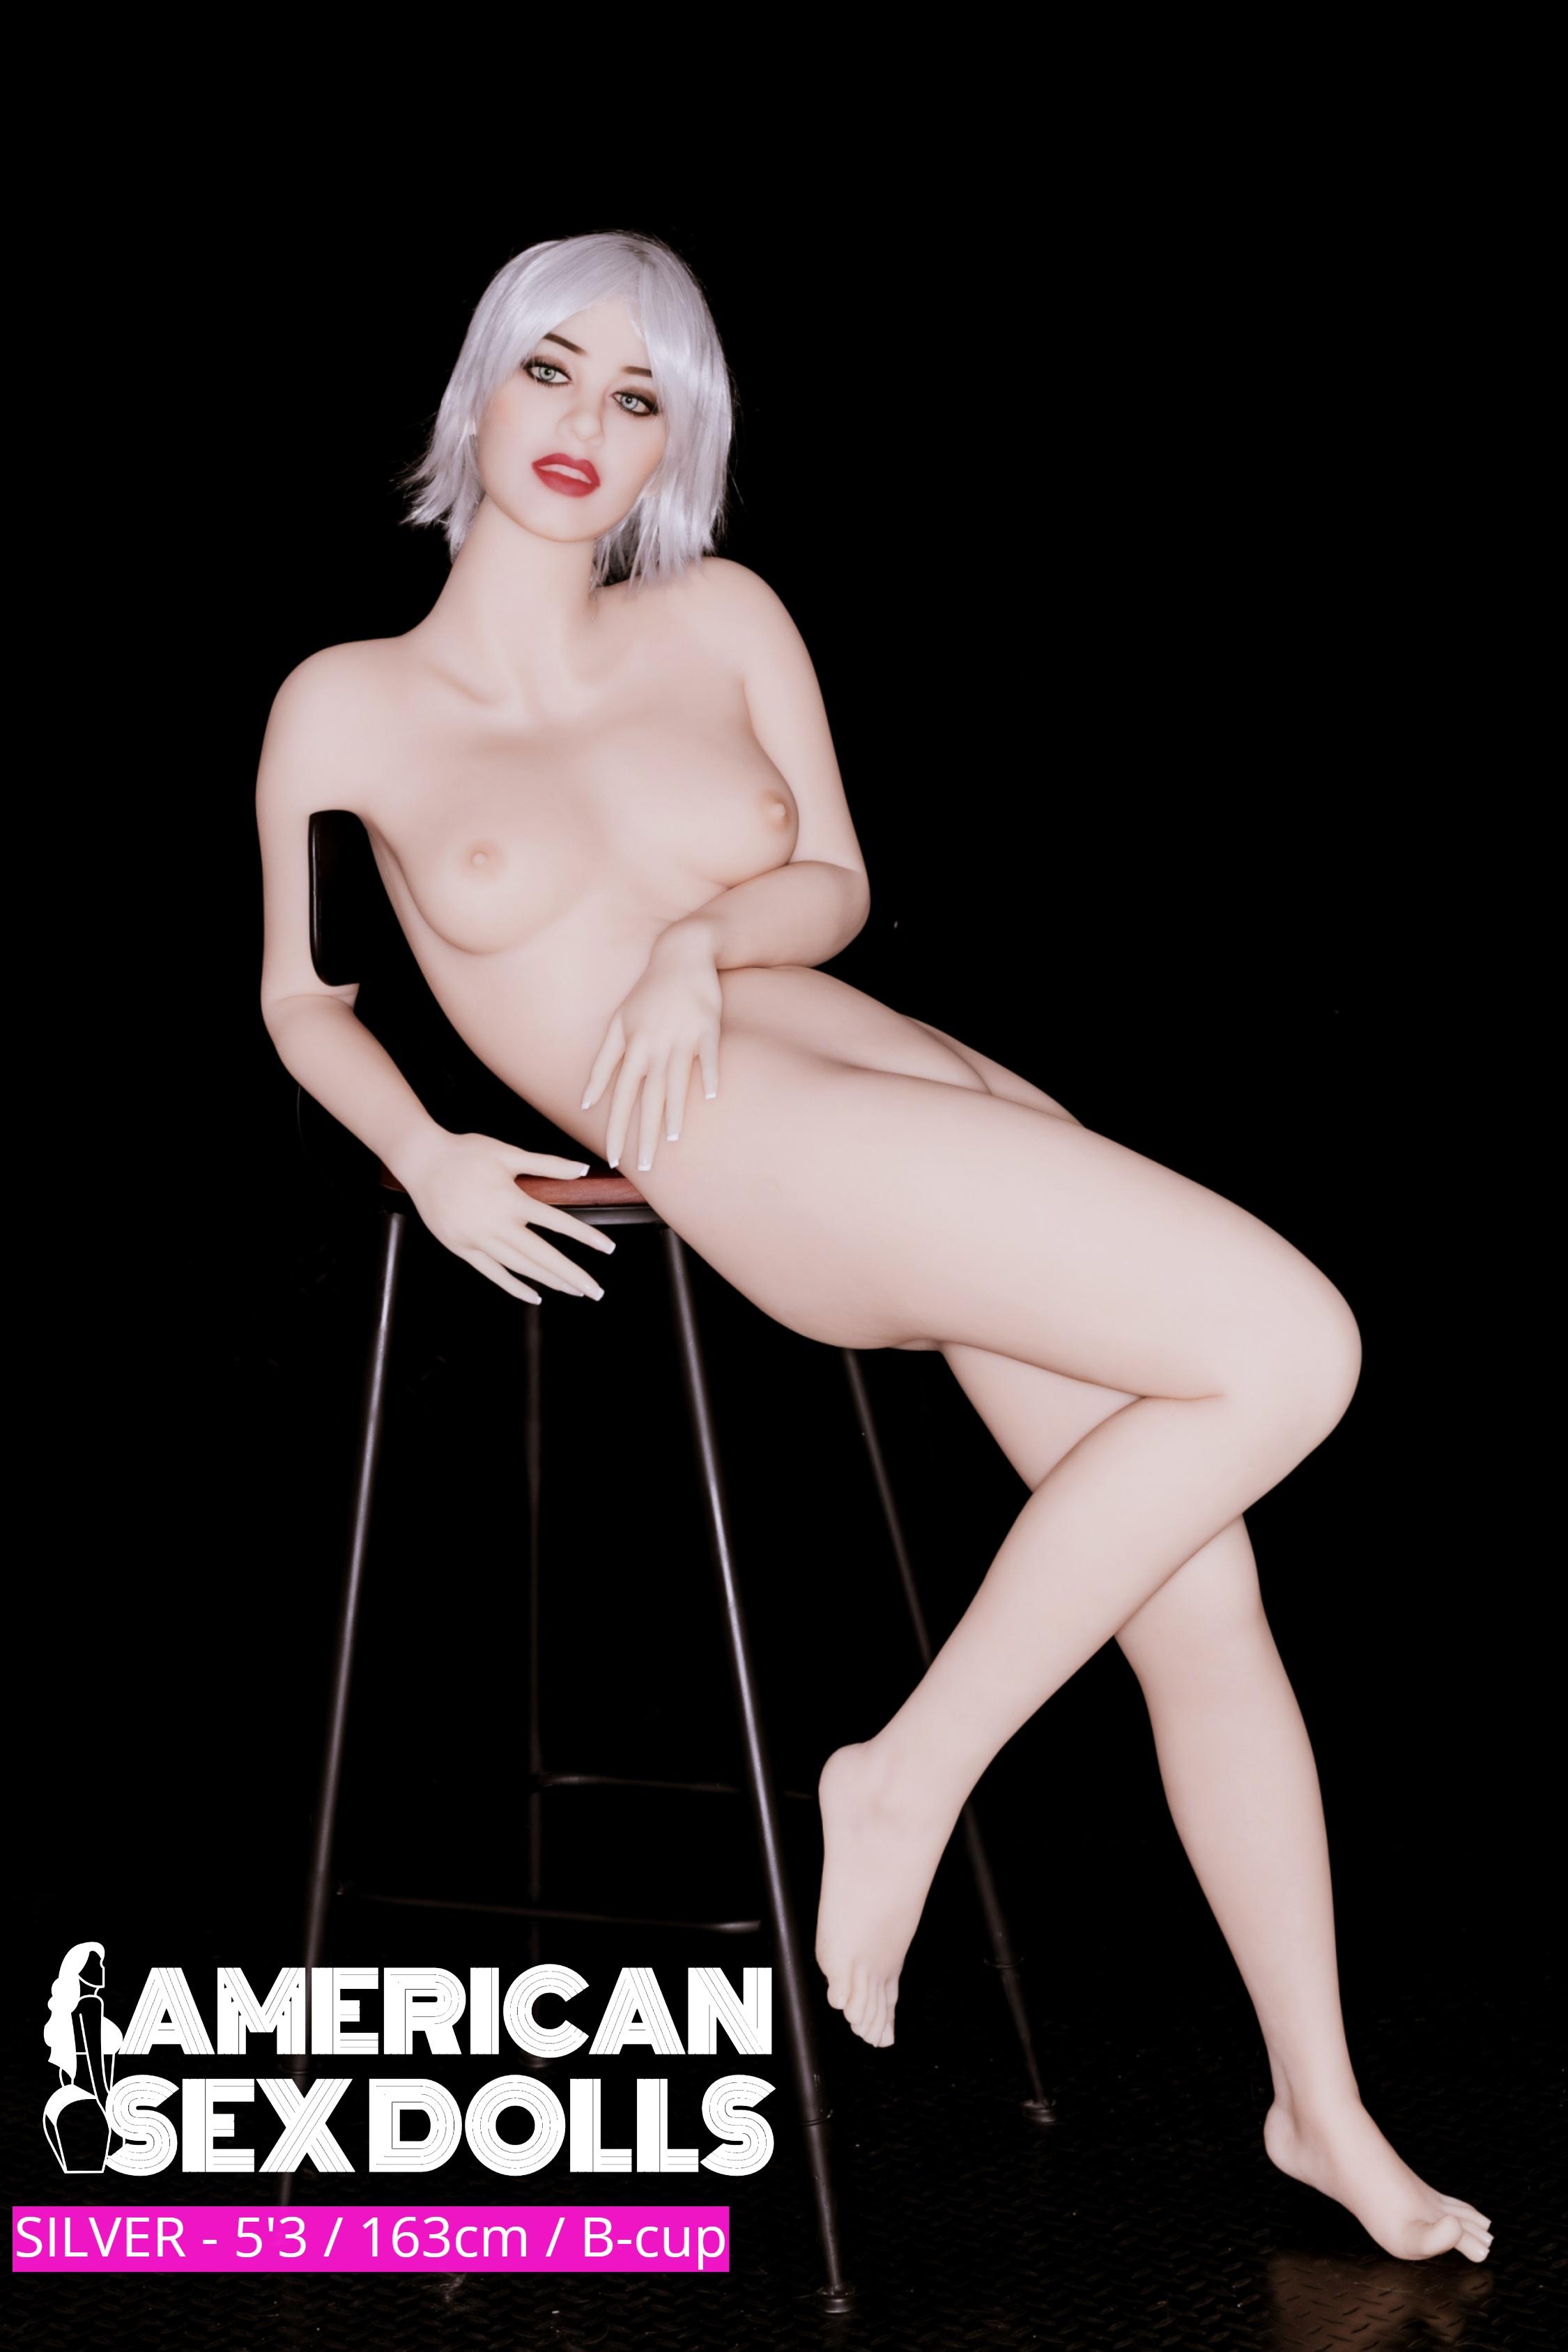 American Sex Doll WMDoll 162 Bcup 234 (5).jpg